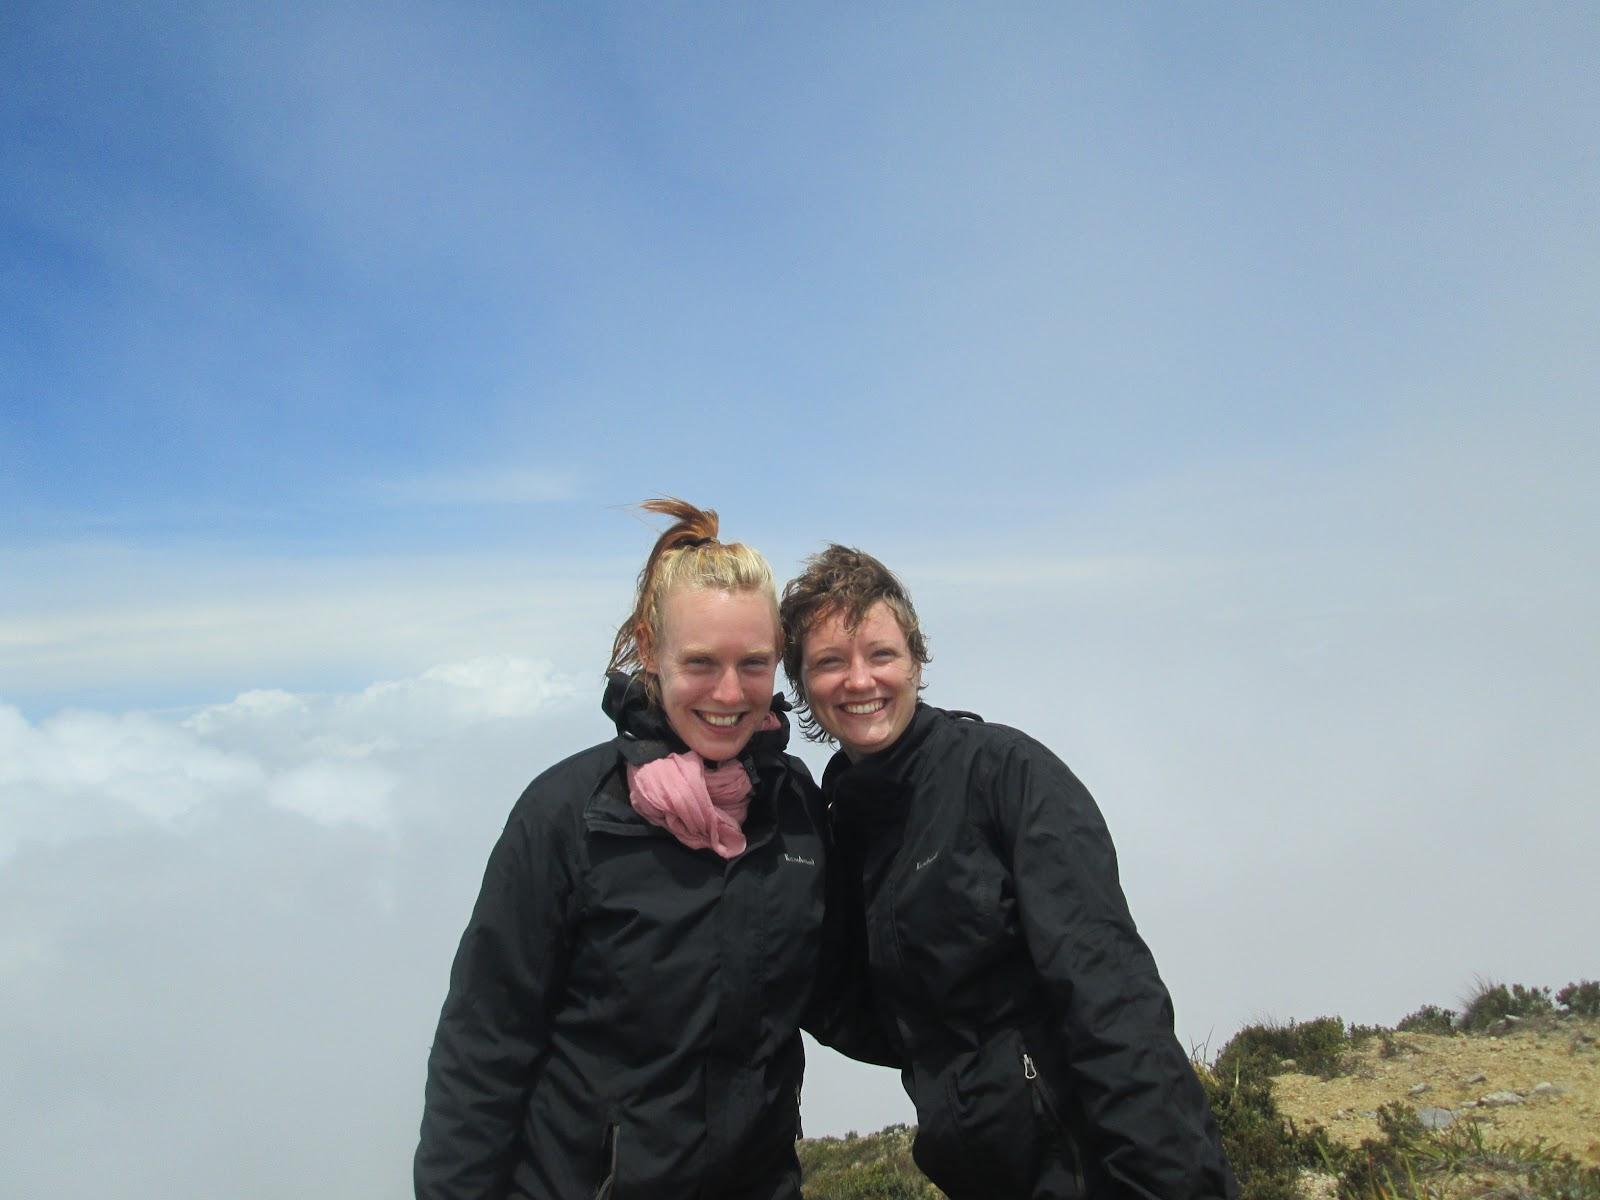 Climb Mt. Apo Philippines